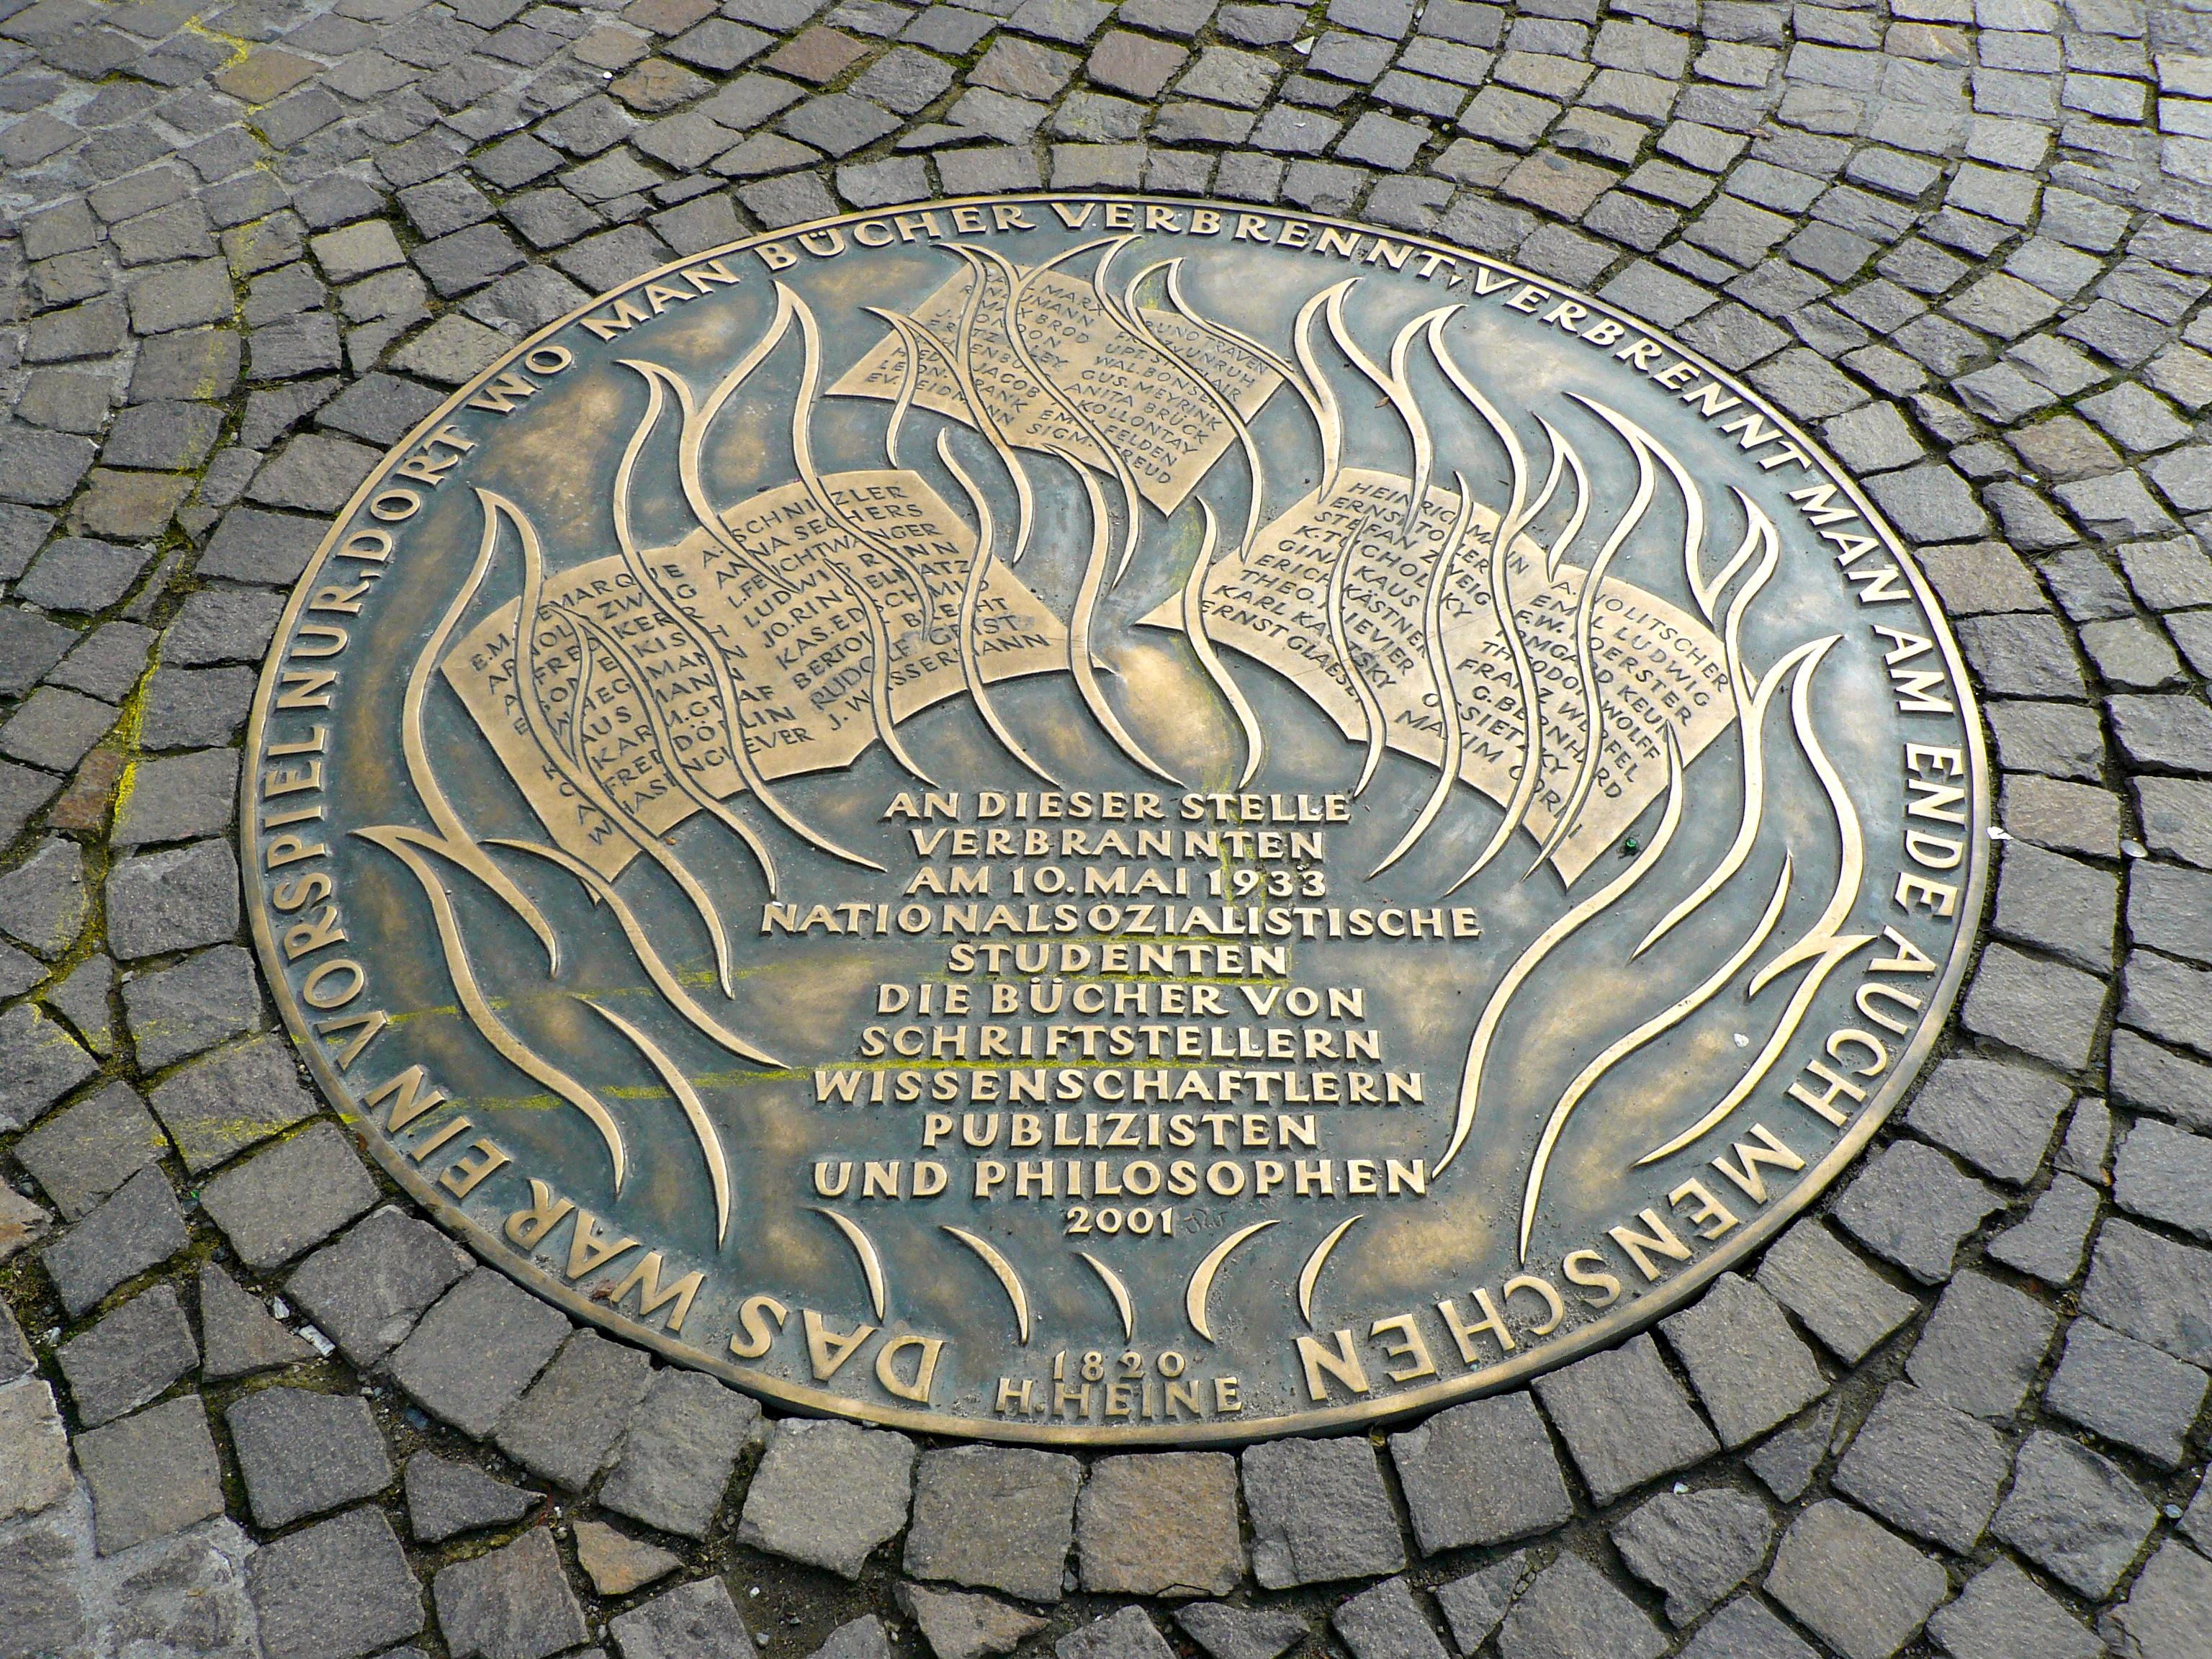 Commemorative_Plaque_book_burning_Frankfurt_Hesse_Germany